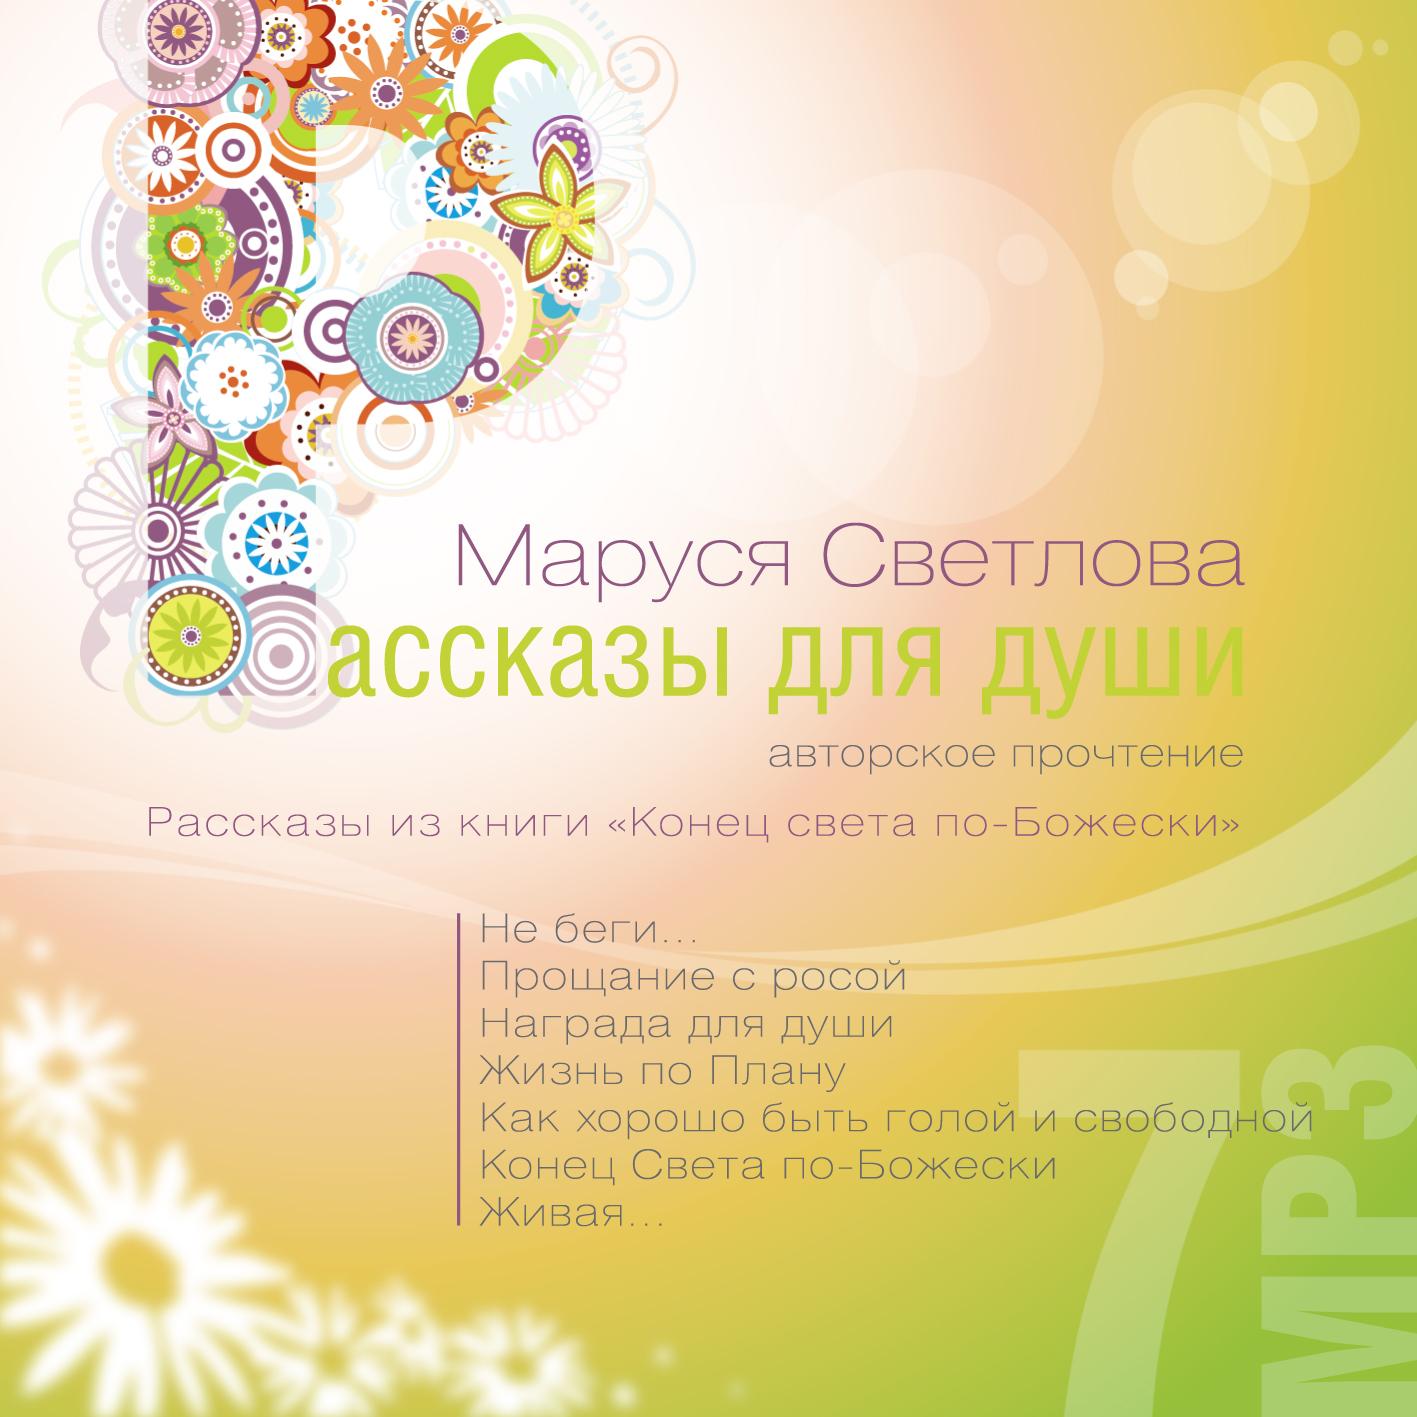 Маруся Светлова Конец Света по-Божески маруся светлова капля бога сборник